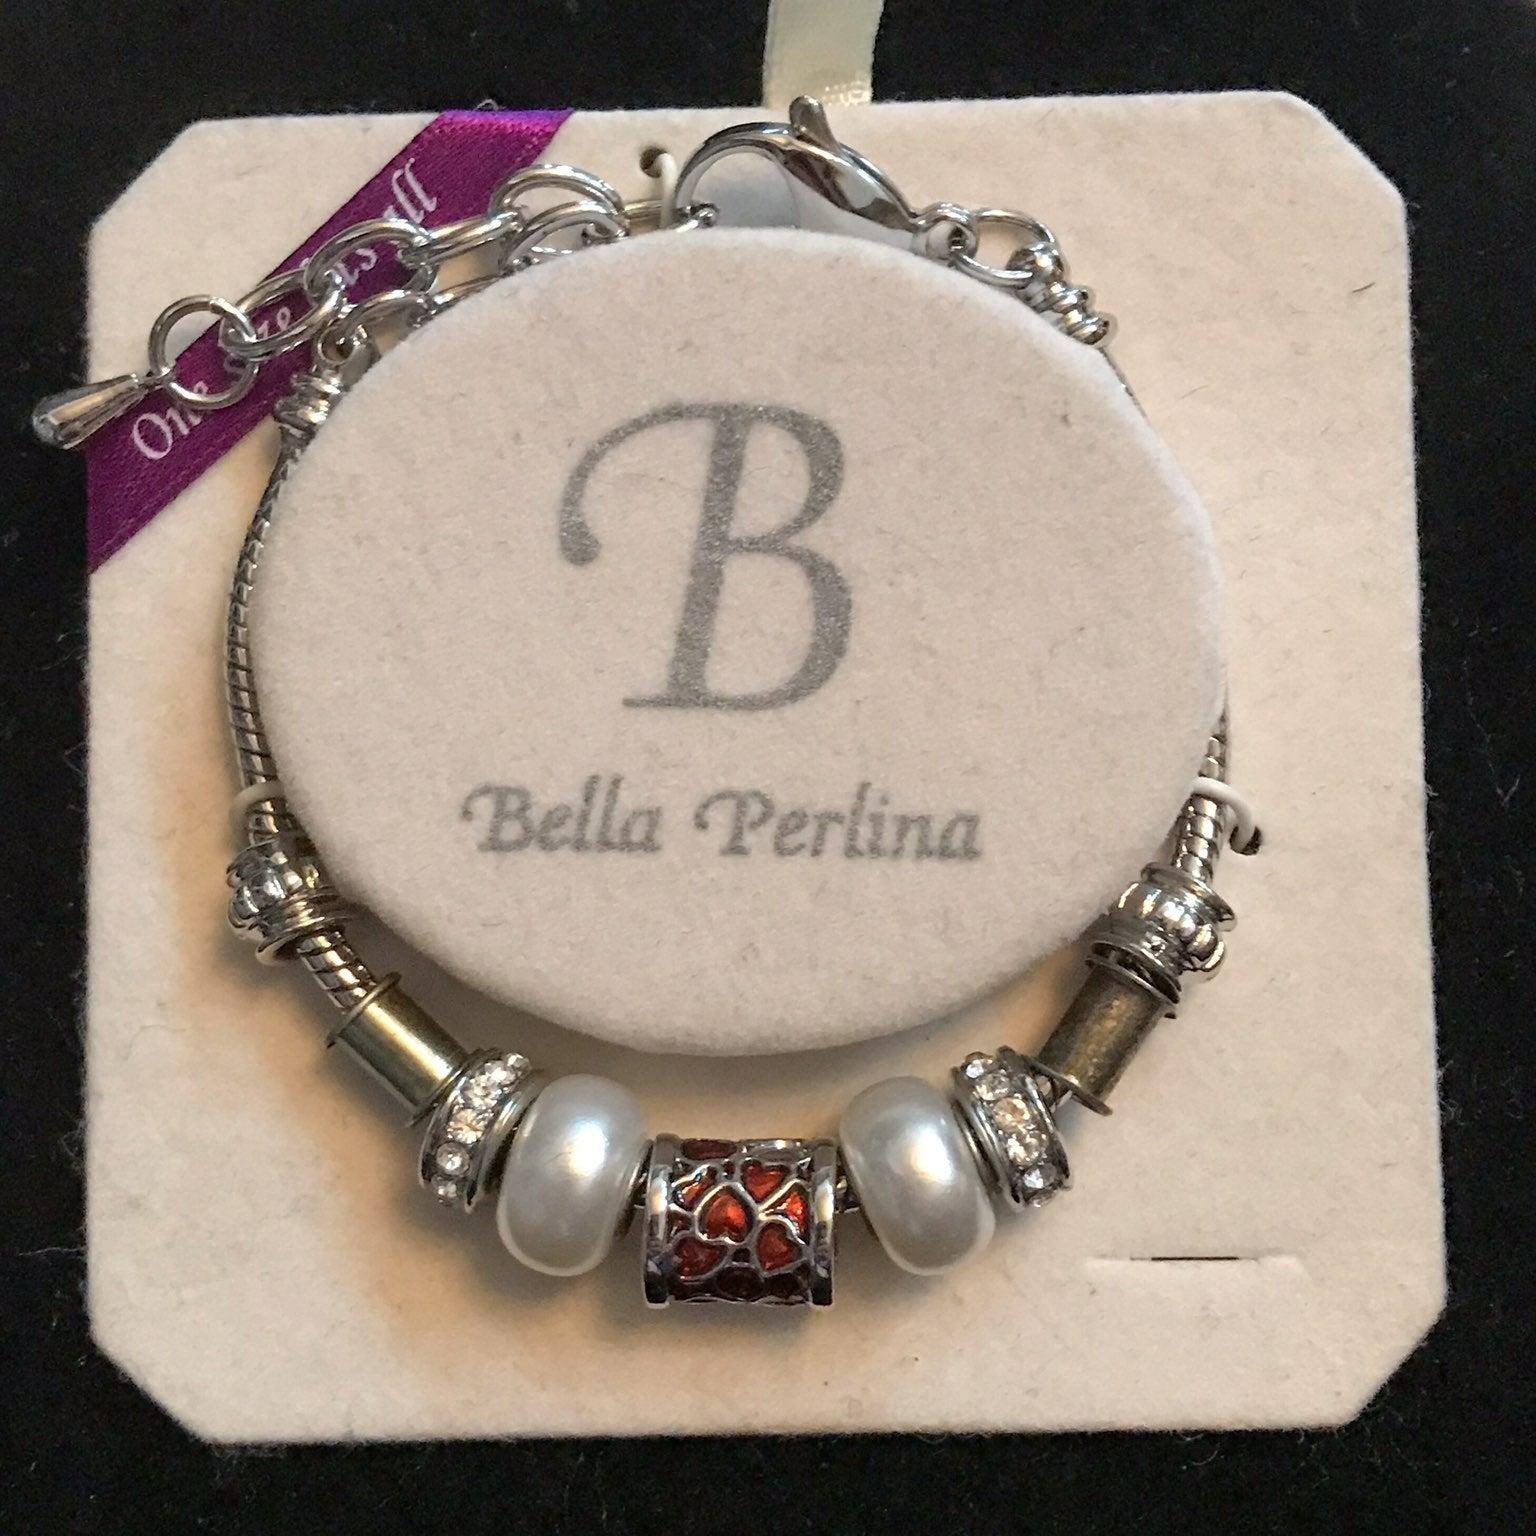 New Bella Perkins Bracelet w/charms